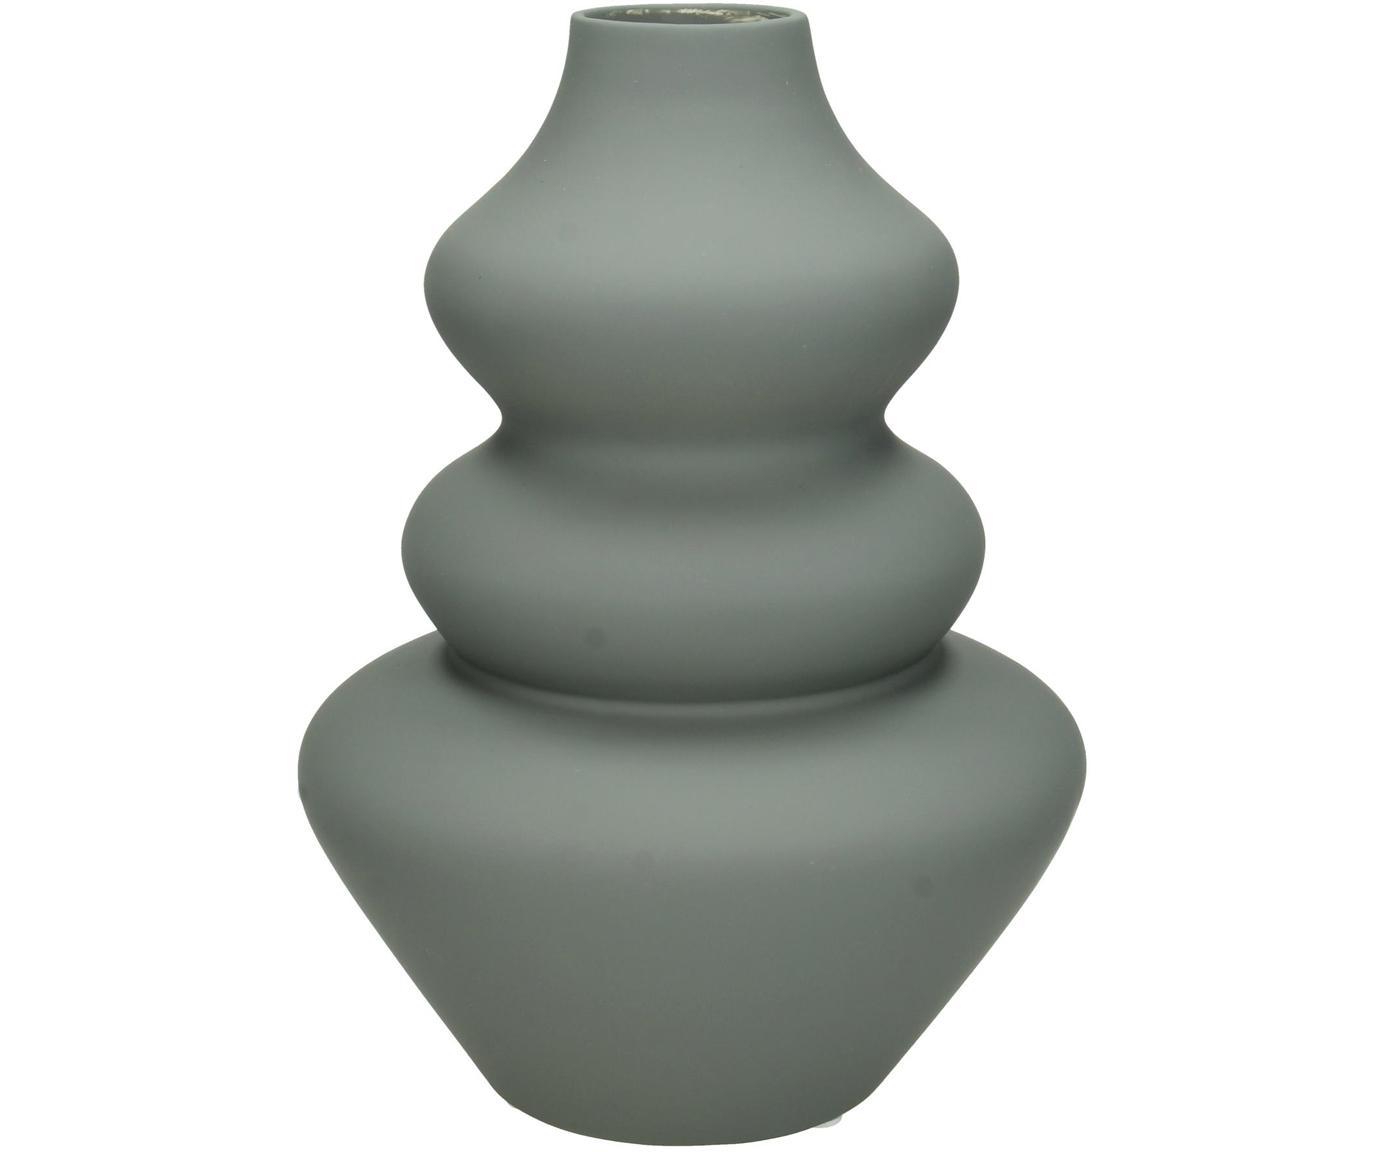 Vaso in terracotta Thena, Terracotta, Grigio, Ø 15 x Alt. 22 cm